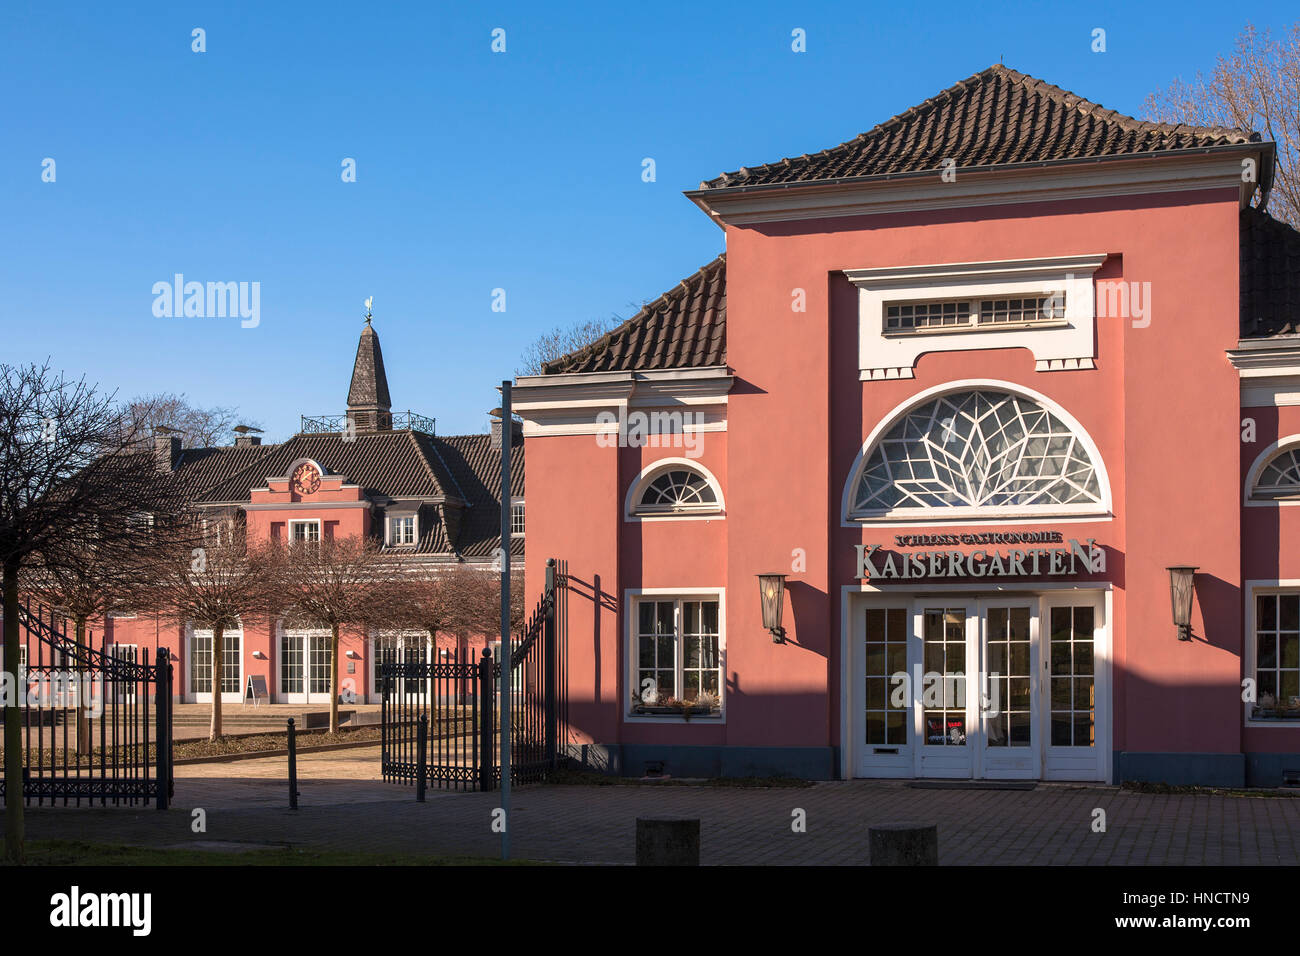 Germany, North Rhine-Westphalia, Ruhr area, Oberhausen, the castle. Stock Photo